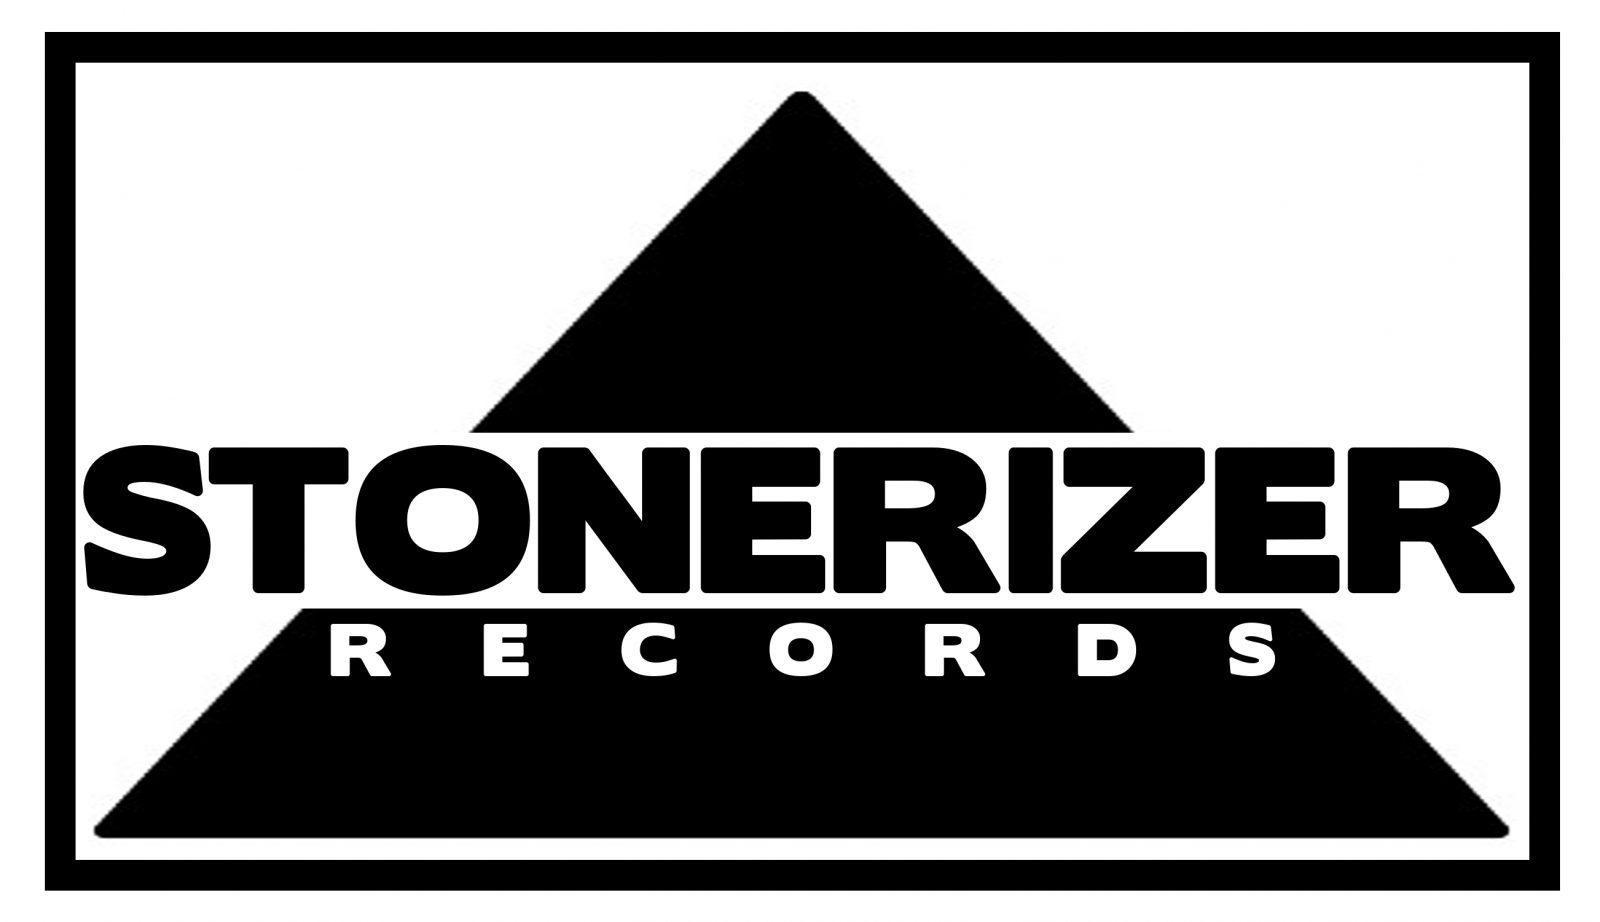 Stonerizer records LOGO